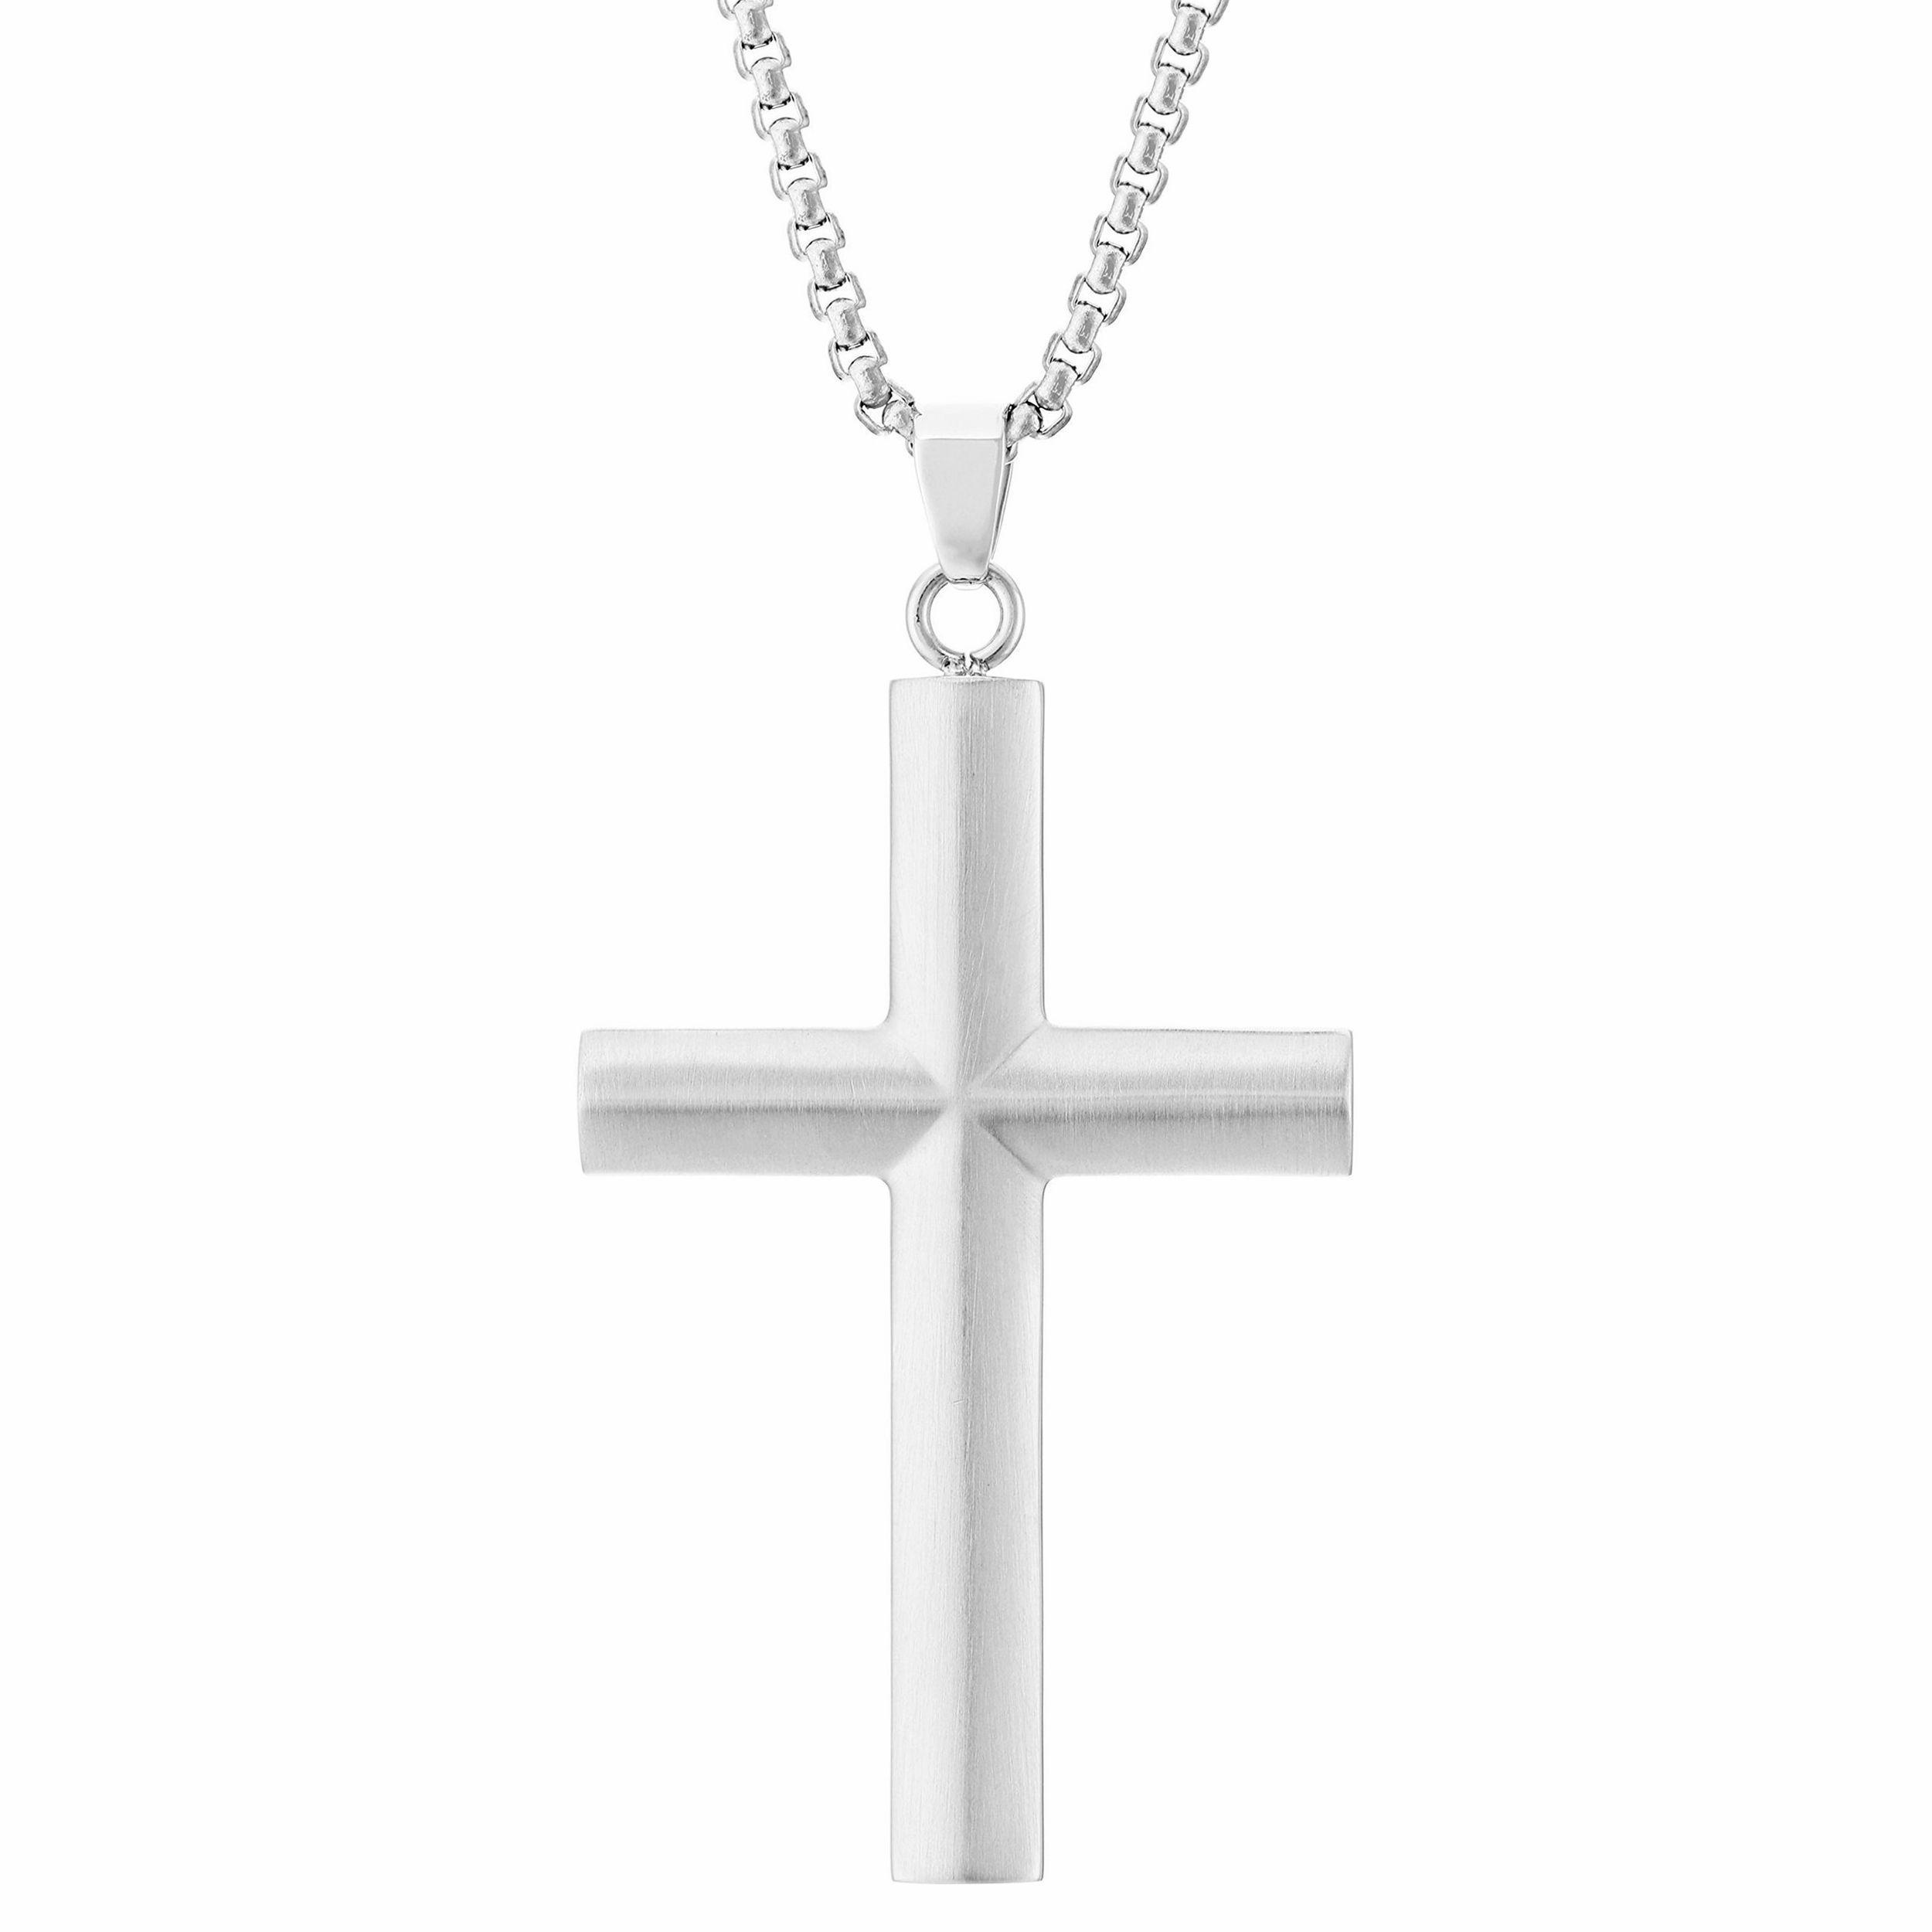 09ebd0892f6 Stainless Steel Men s Cross Pendant Necklace (Silvertone)